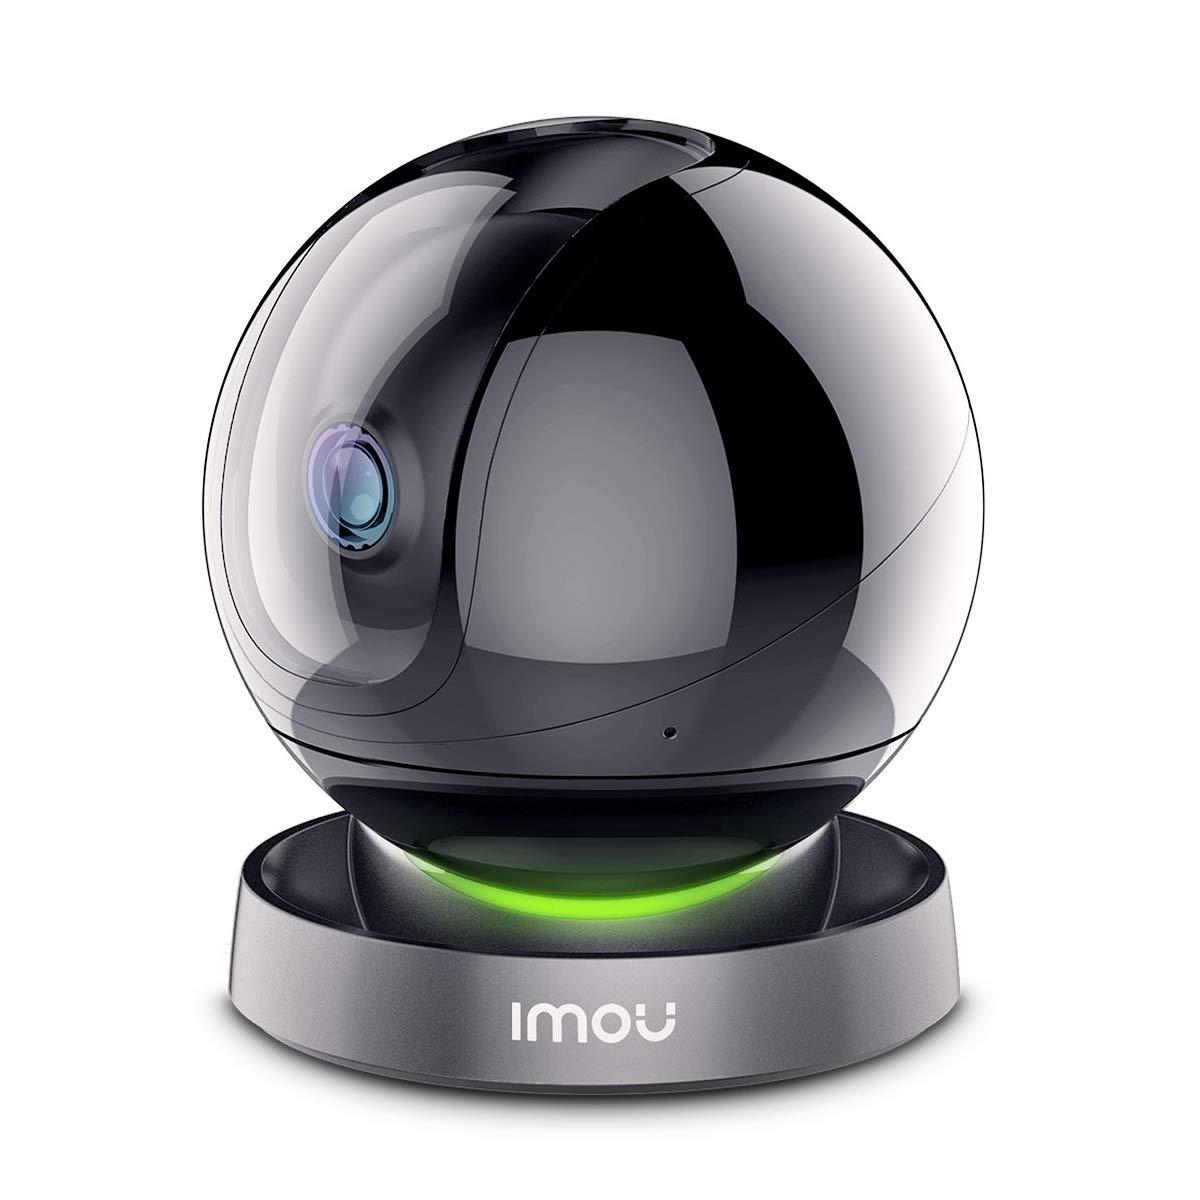 Caméra de sécurité Imou - 1080P, WiFi (Vendeur tiers)